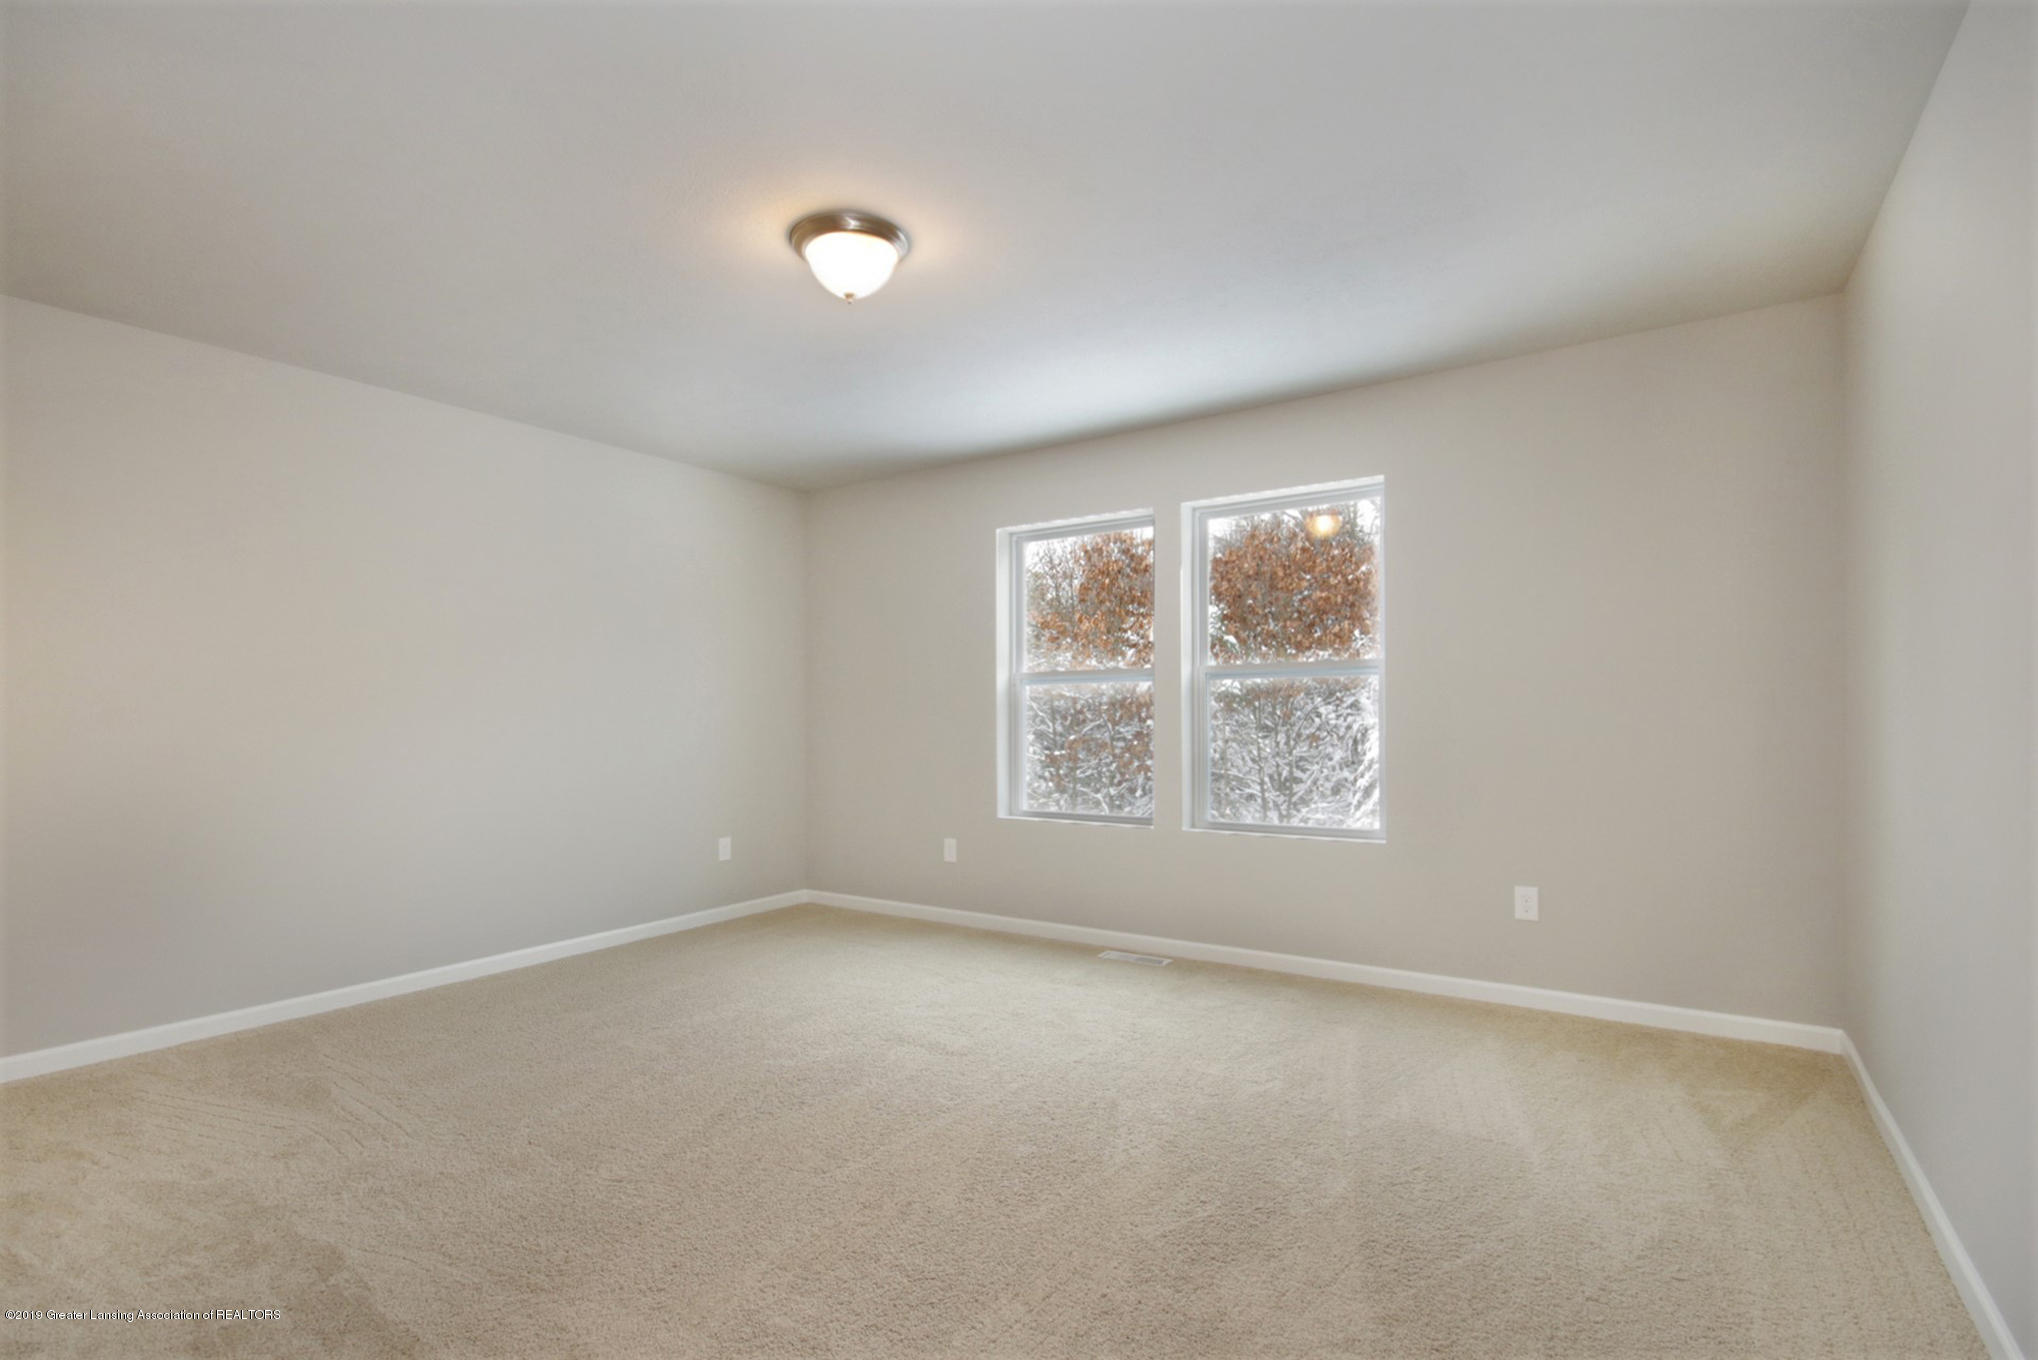 14171 Cordaleigh Dr - GSC035-E1600 Master Bedroom1 - 9